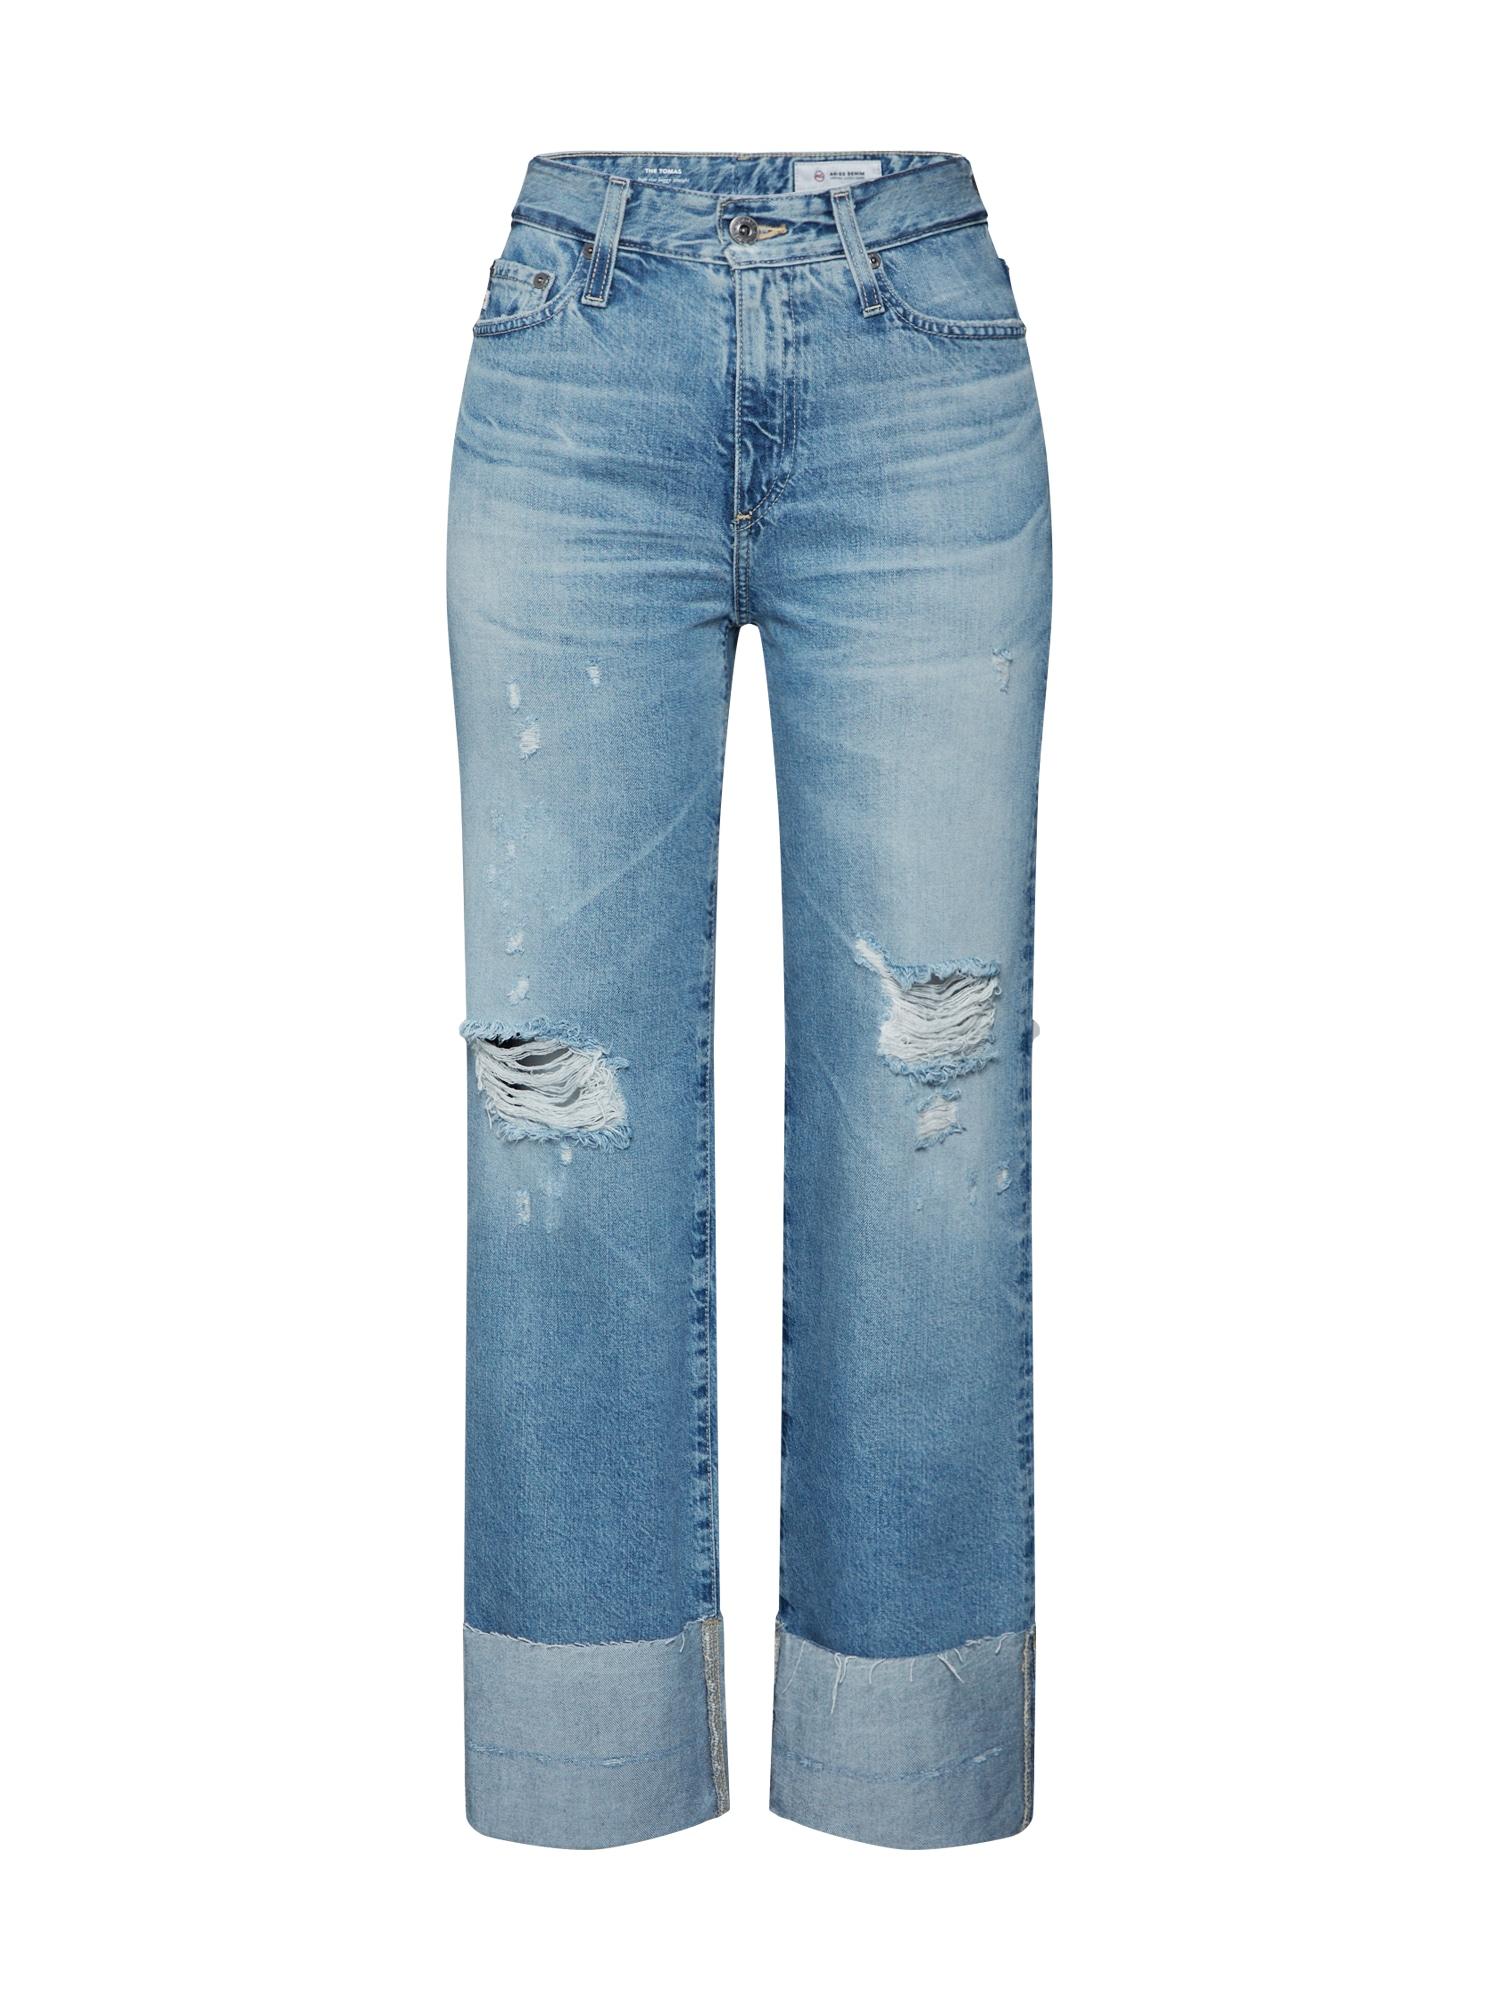 AG Jeans Džinsai 'TOMAS' tamsiai (džinso) mėlyna